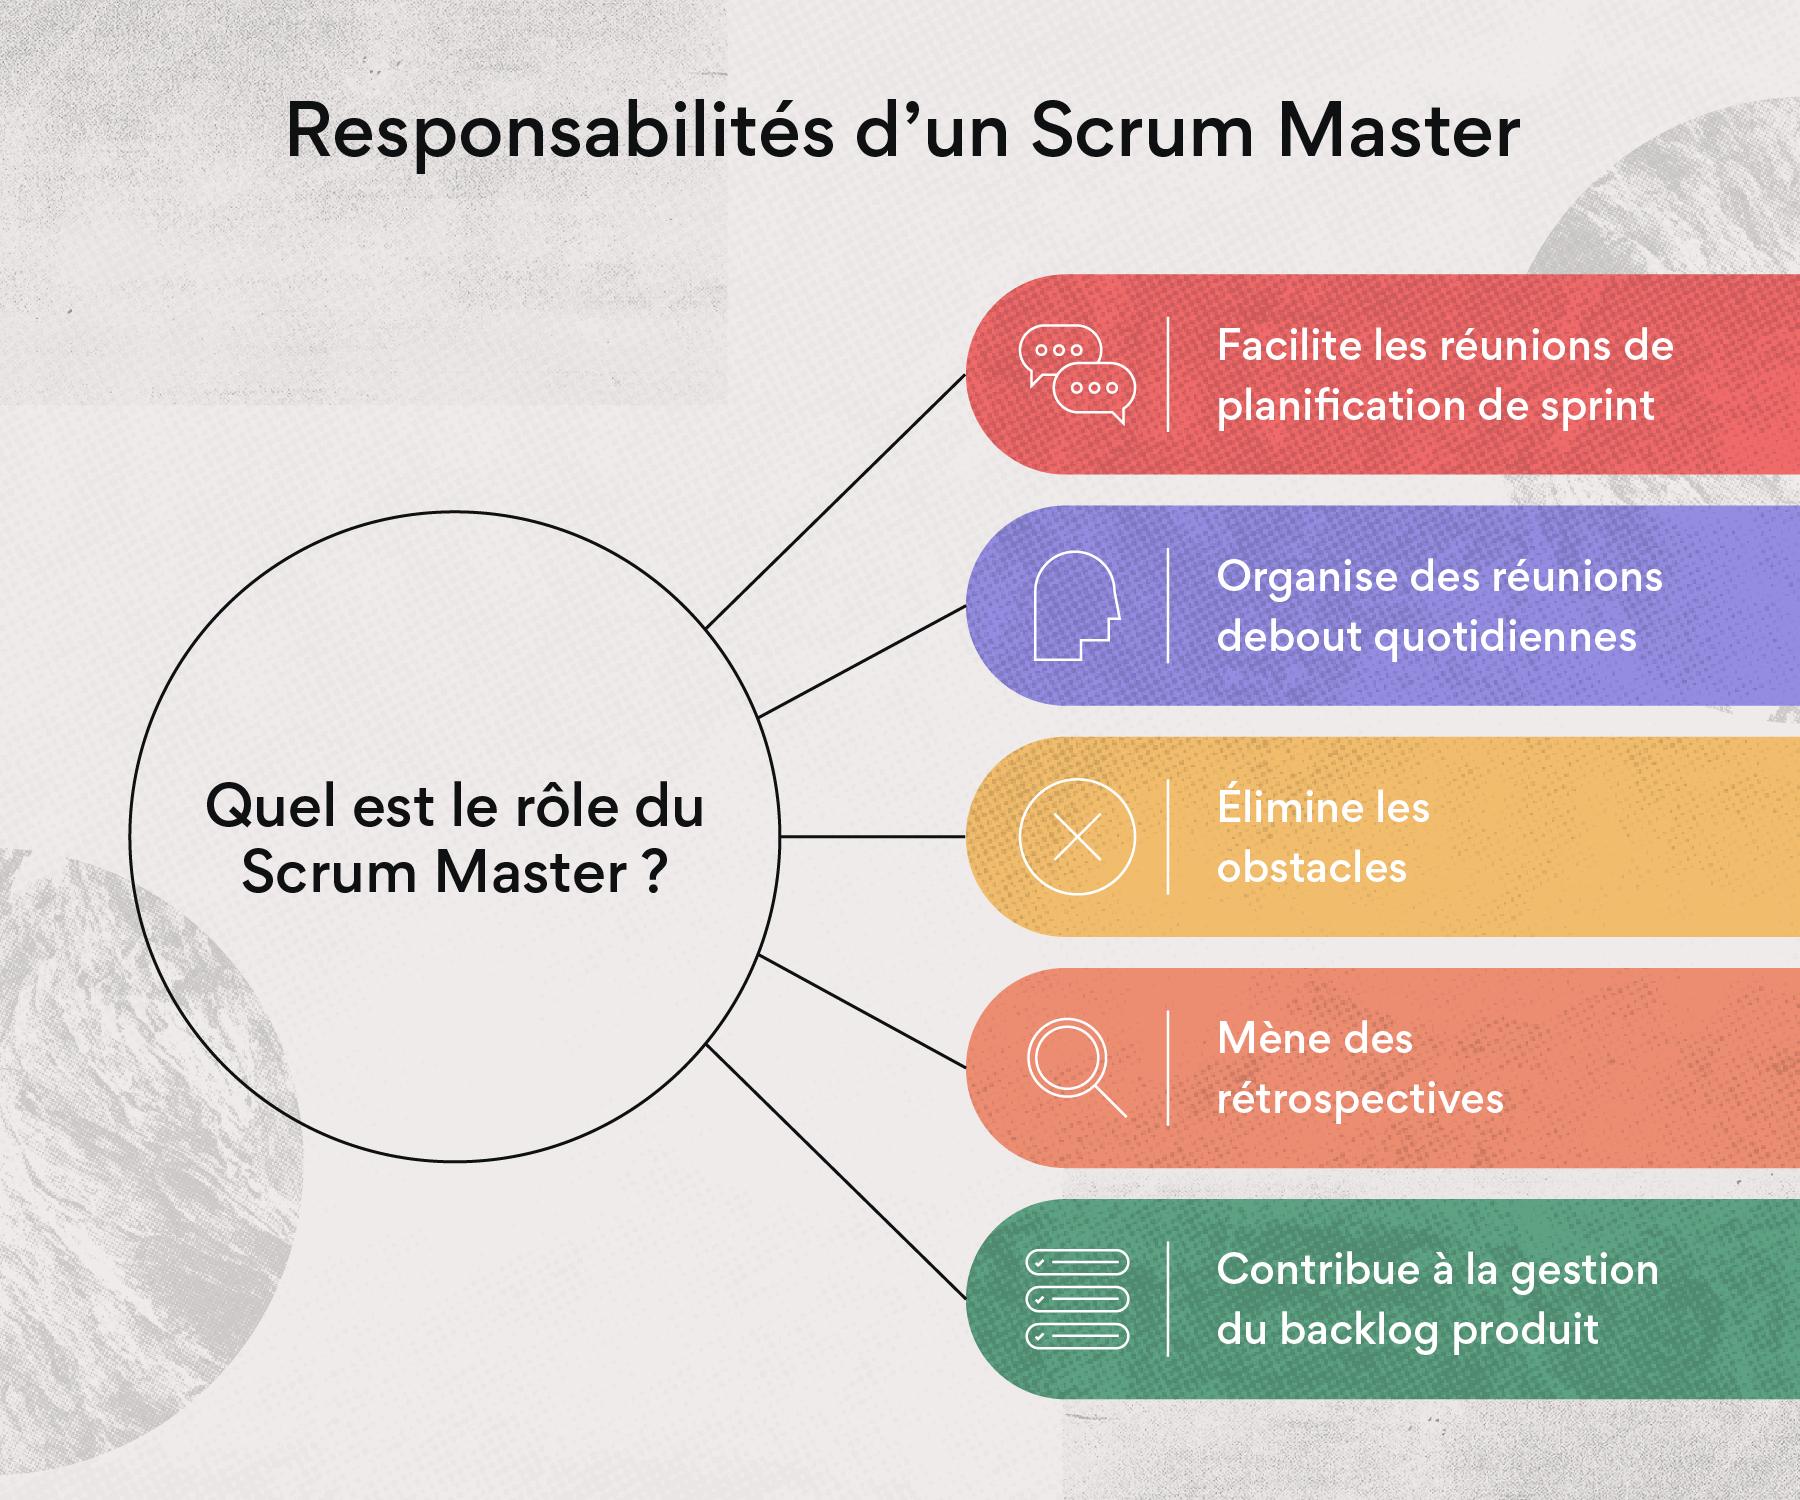 Responsabilités d'un Scrum Master